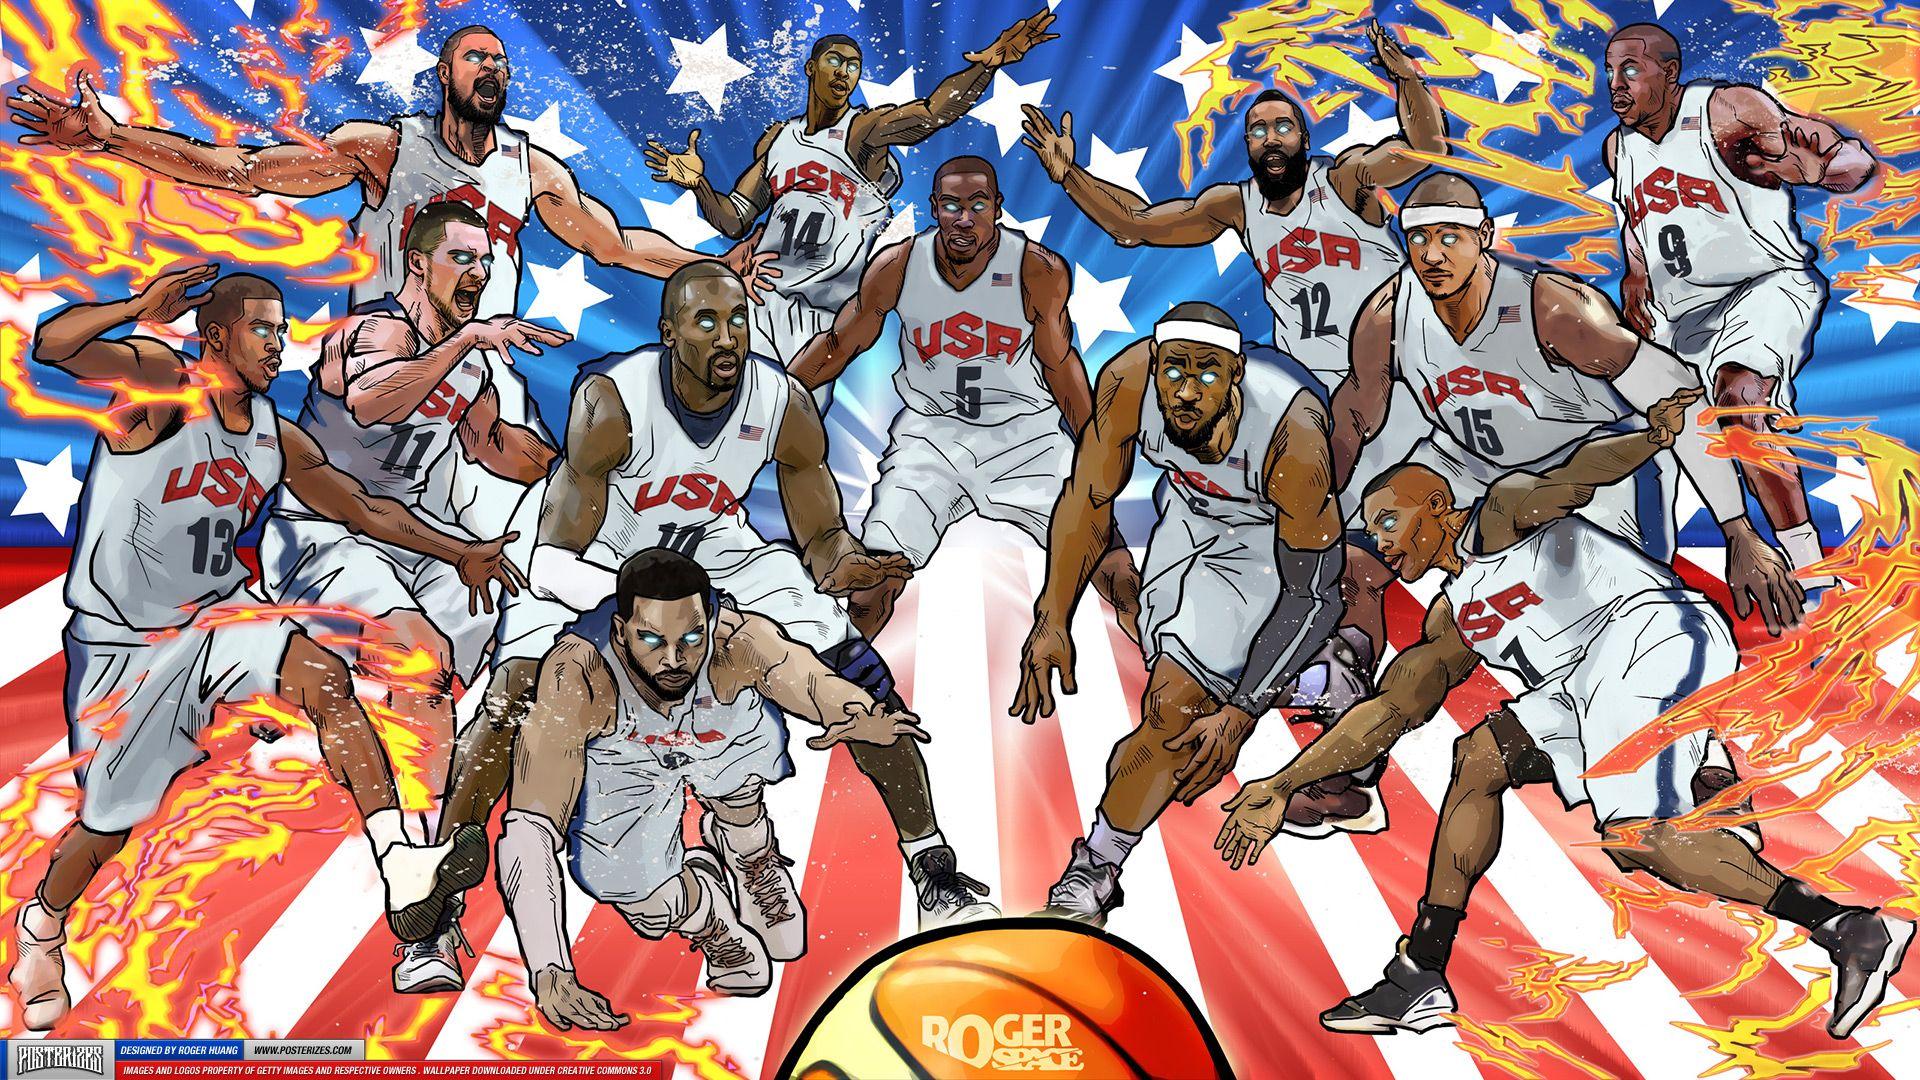 Team Usa 2012 Olympic Wallpaper Nba Wallpapers Team Wallpaper Basketball Wallpaper